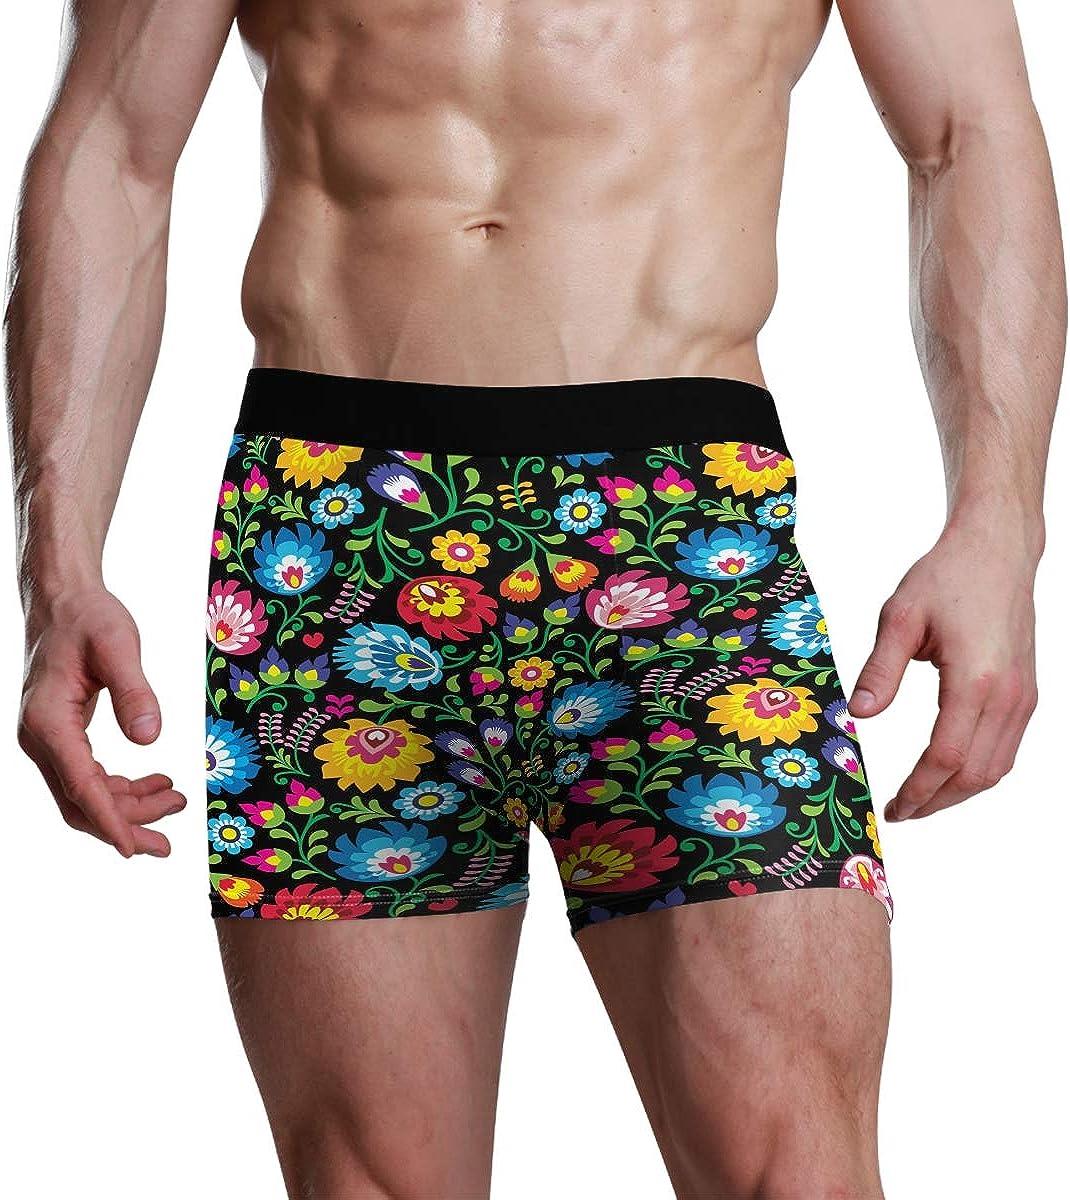 Men's Underwear Seamless Vector Polish Folk Art Floral Pattern Breathable Boxer Briefs Low Rise Long Leg